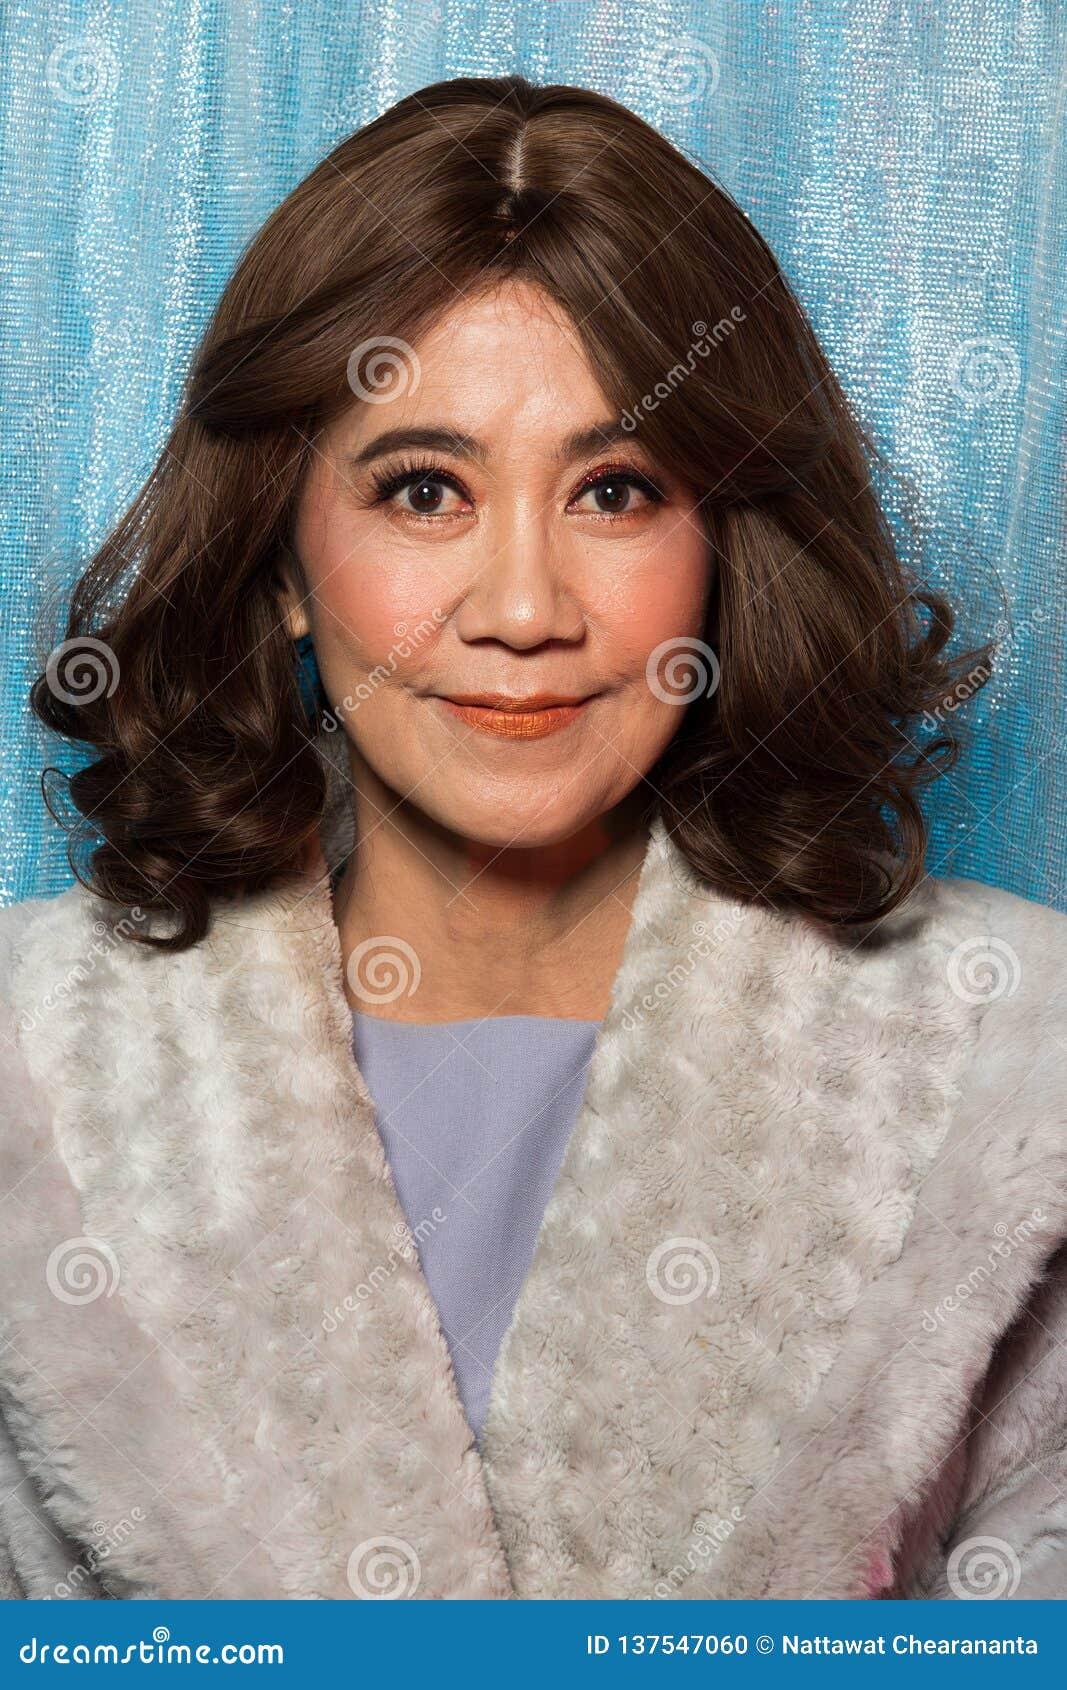 50s 60s岁塑造亚洲妇女画象